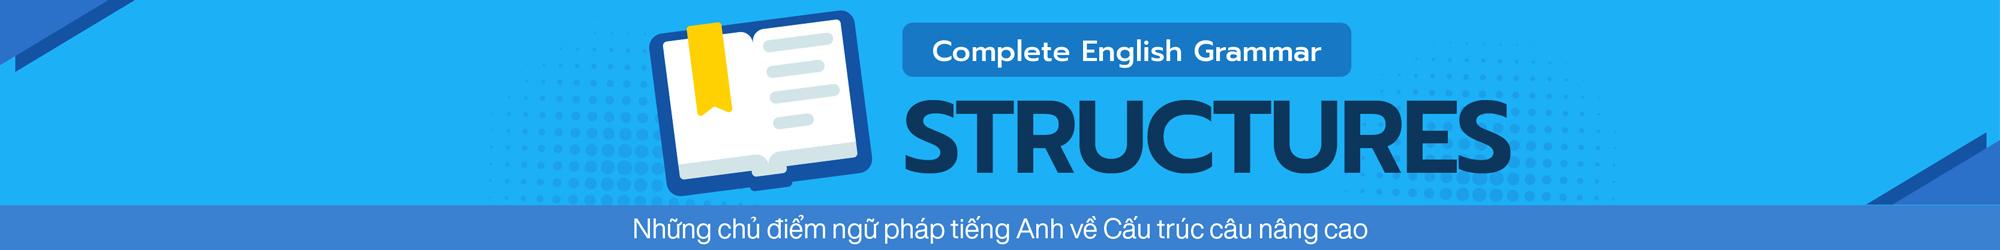 COMPLETE ENGLISH GRAMMAR (STRUCTURES) banner